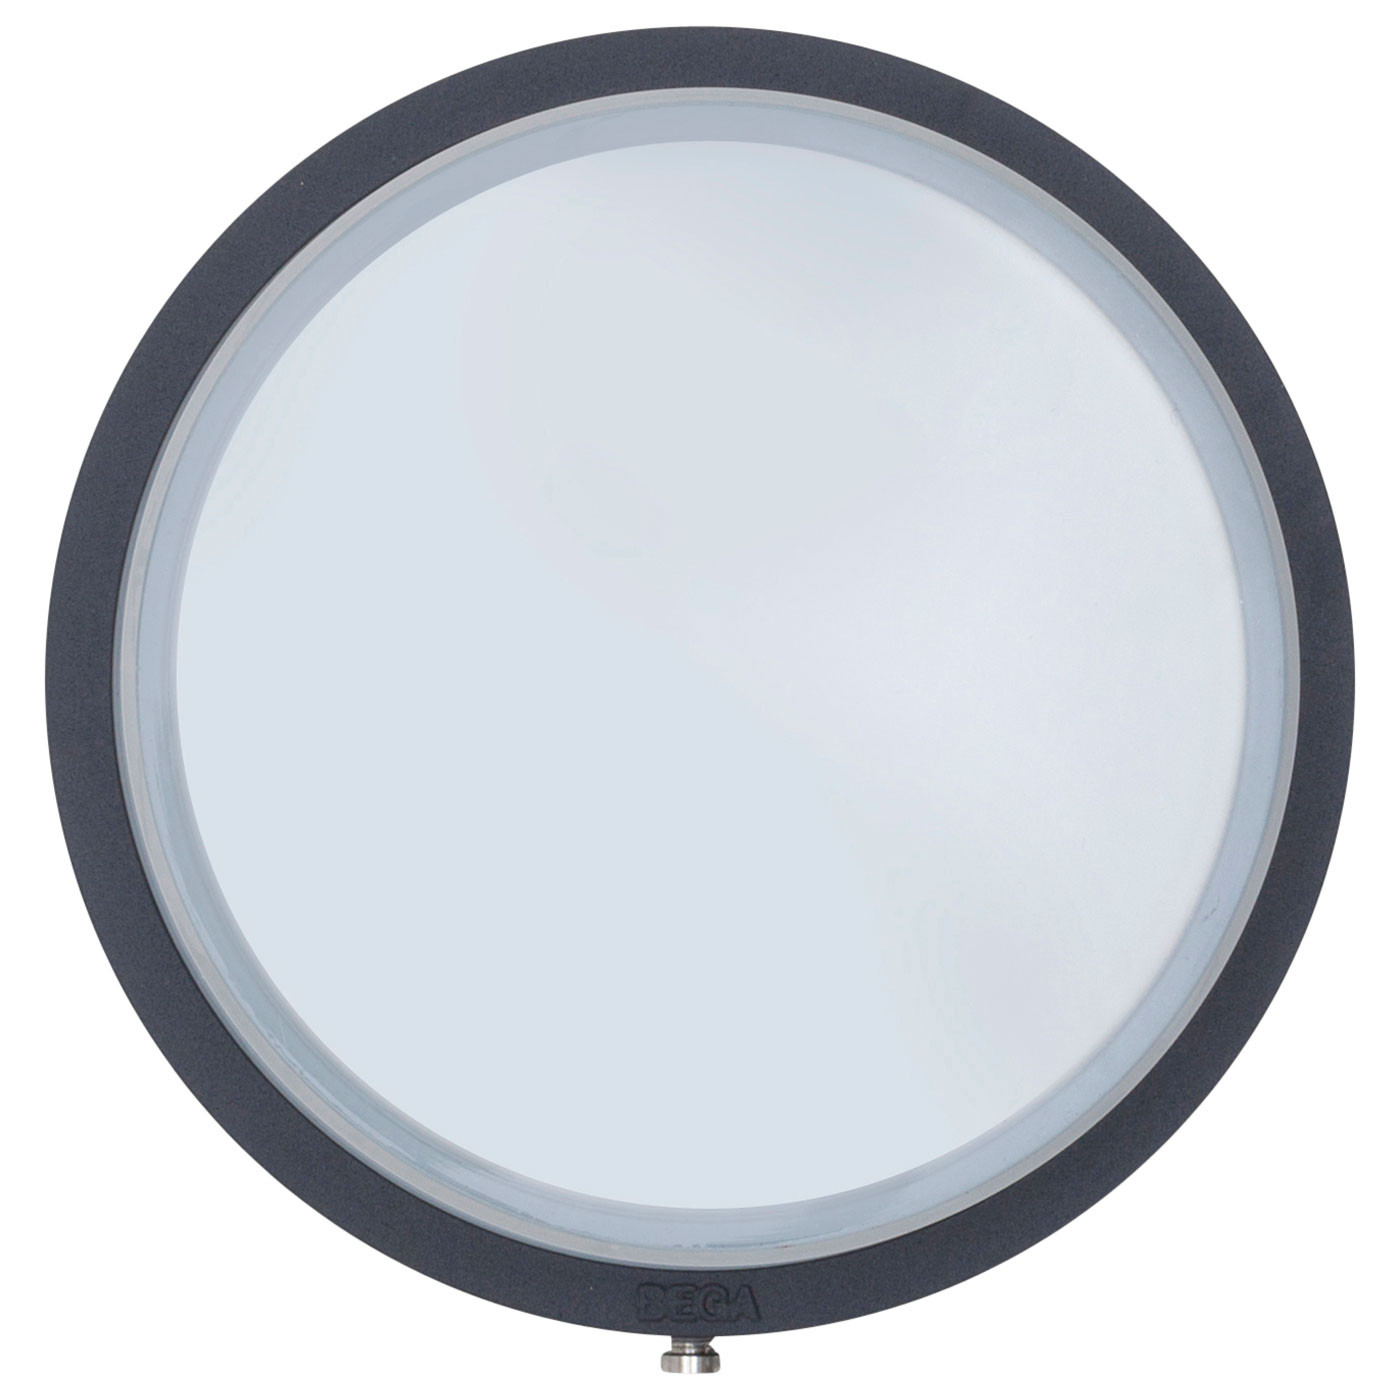 Bega 33535 LED Wand- oder Deckenleuchte